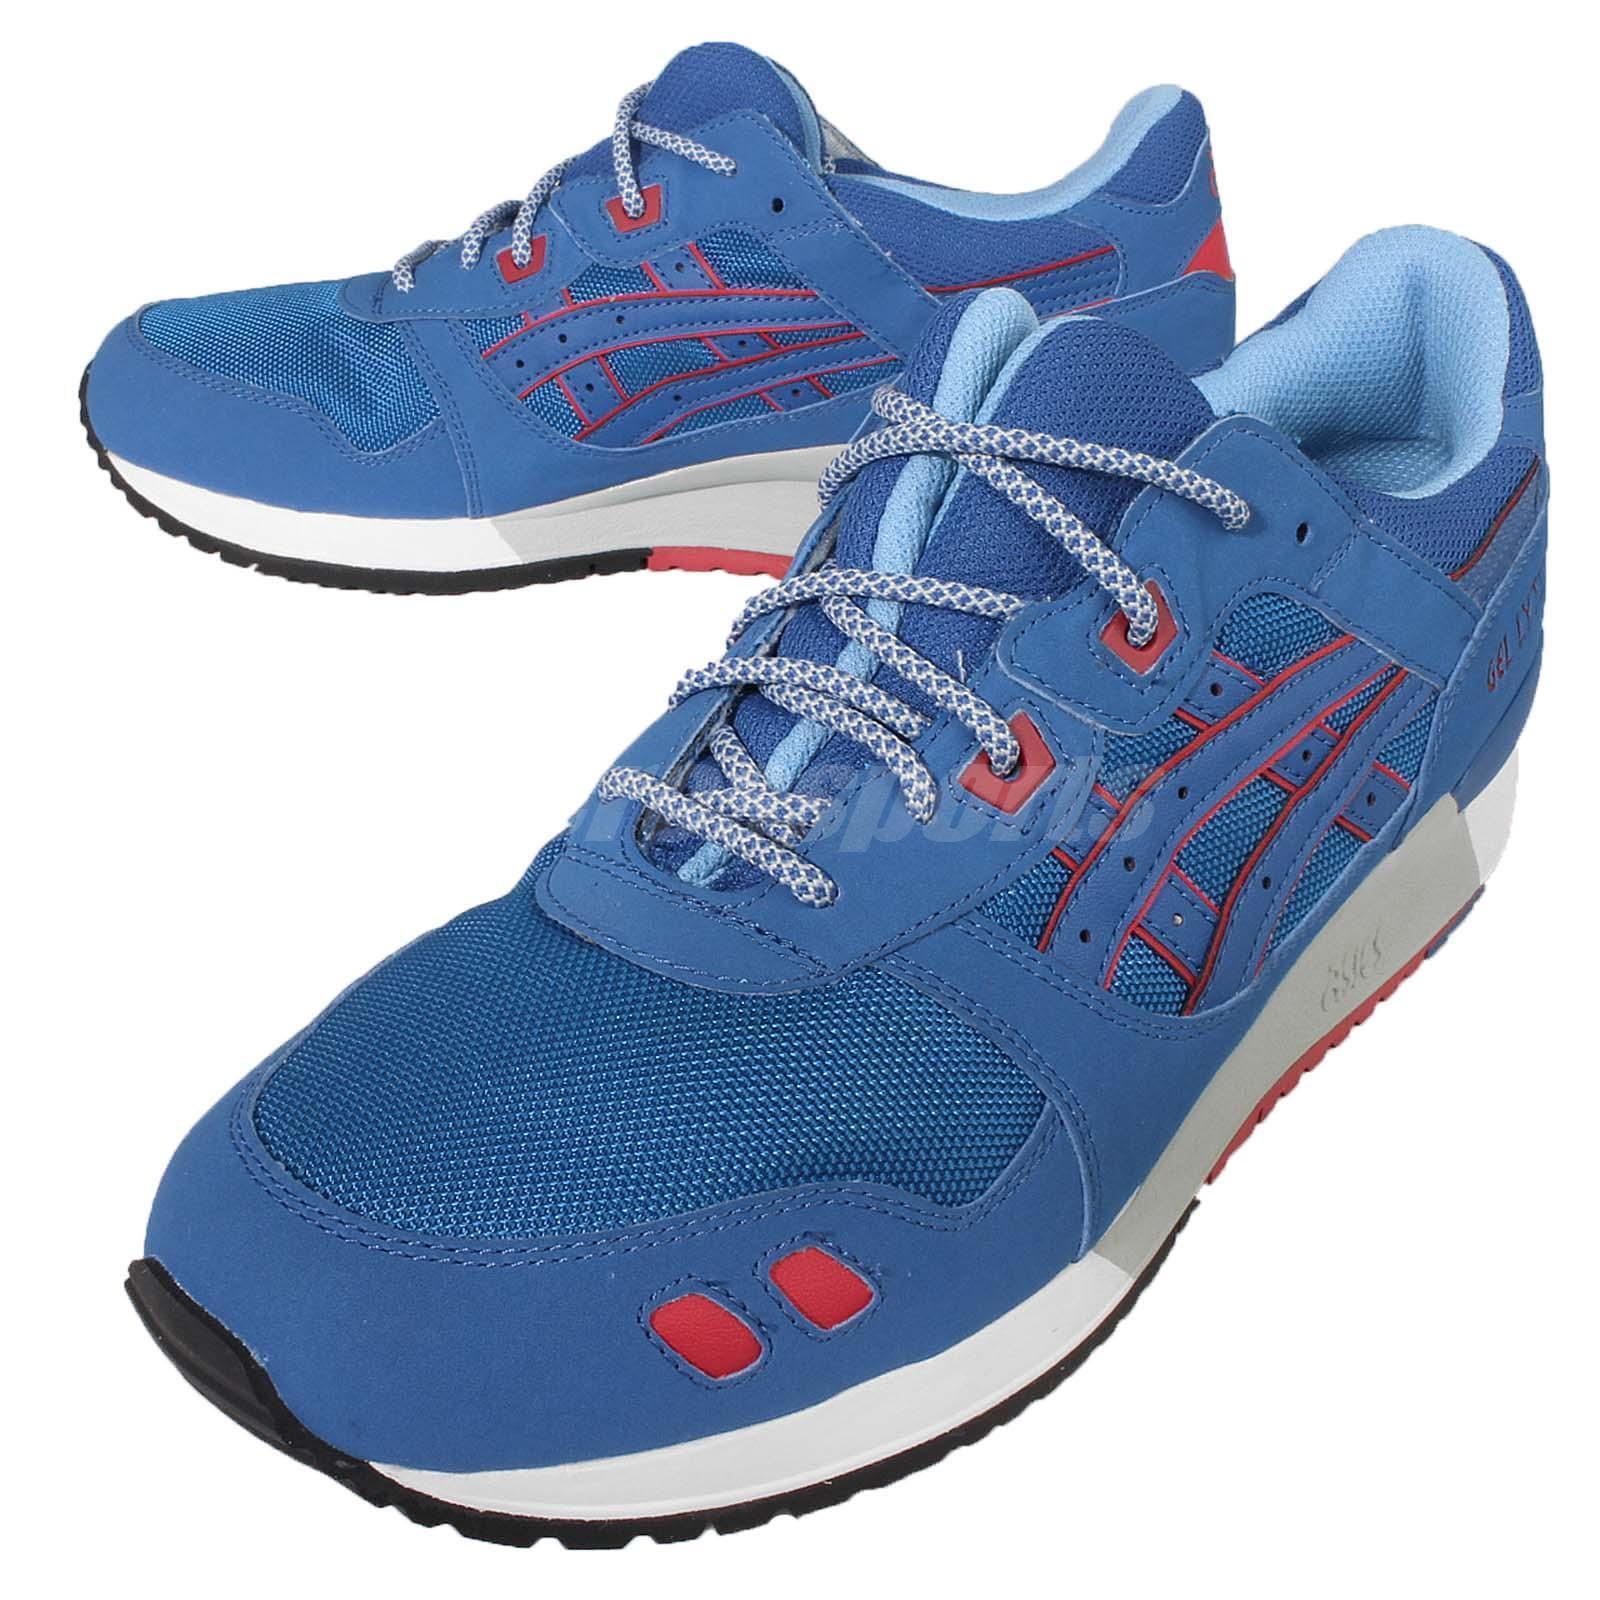 Asics Tiger Gel-Lyte III 3 Future Pack azul rojo Mens Retro zapatillas H637Y-4242